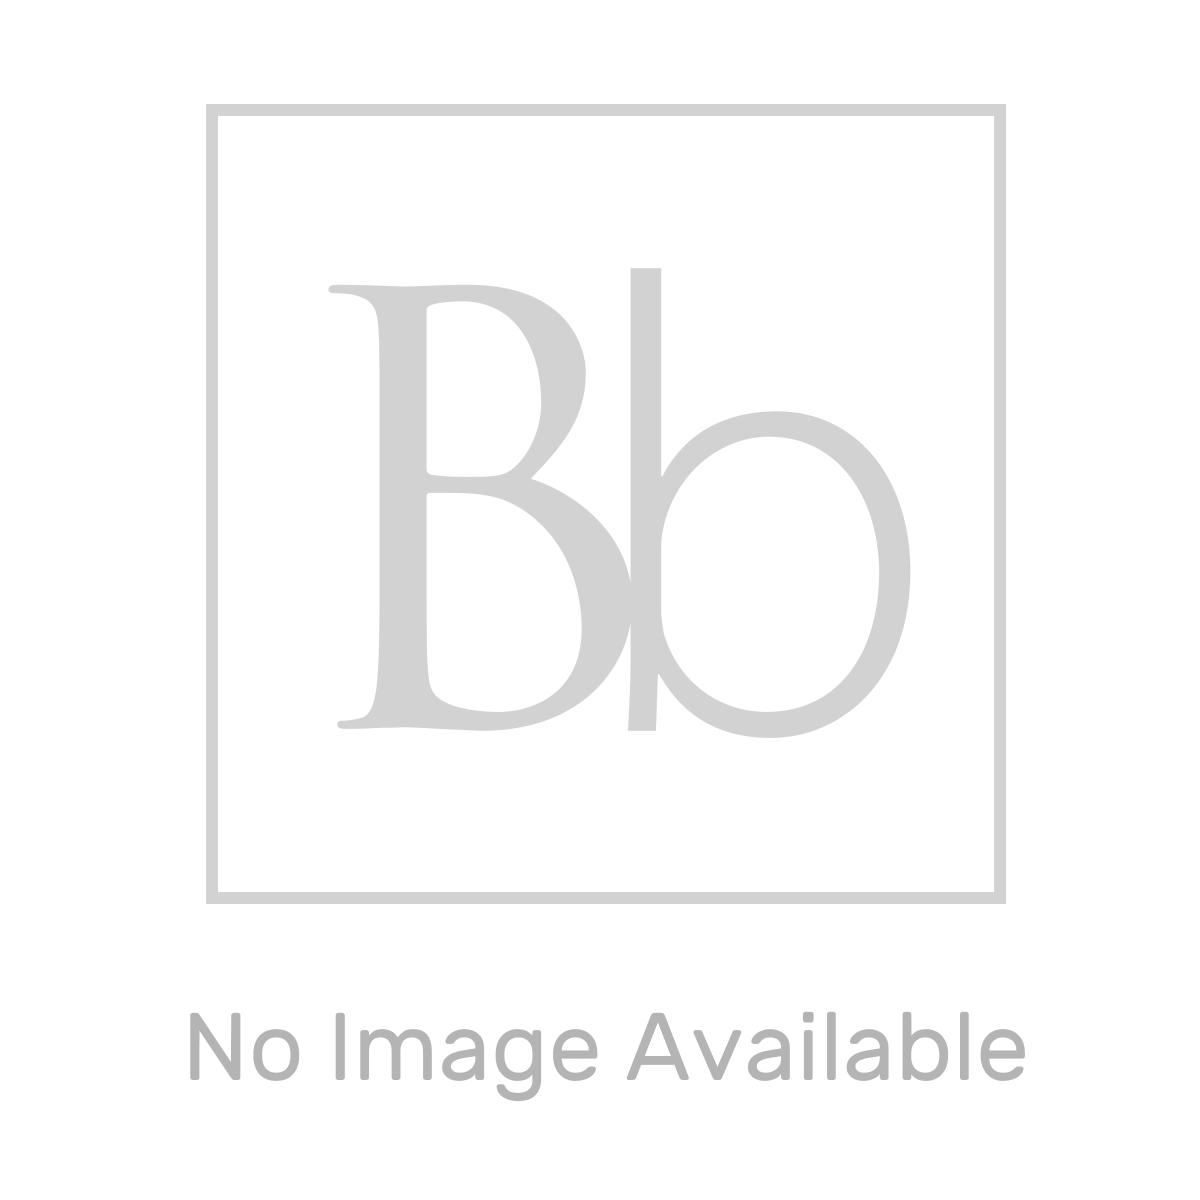 Aquadart Grey Slate Shower Tray 1200 x 900